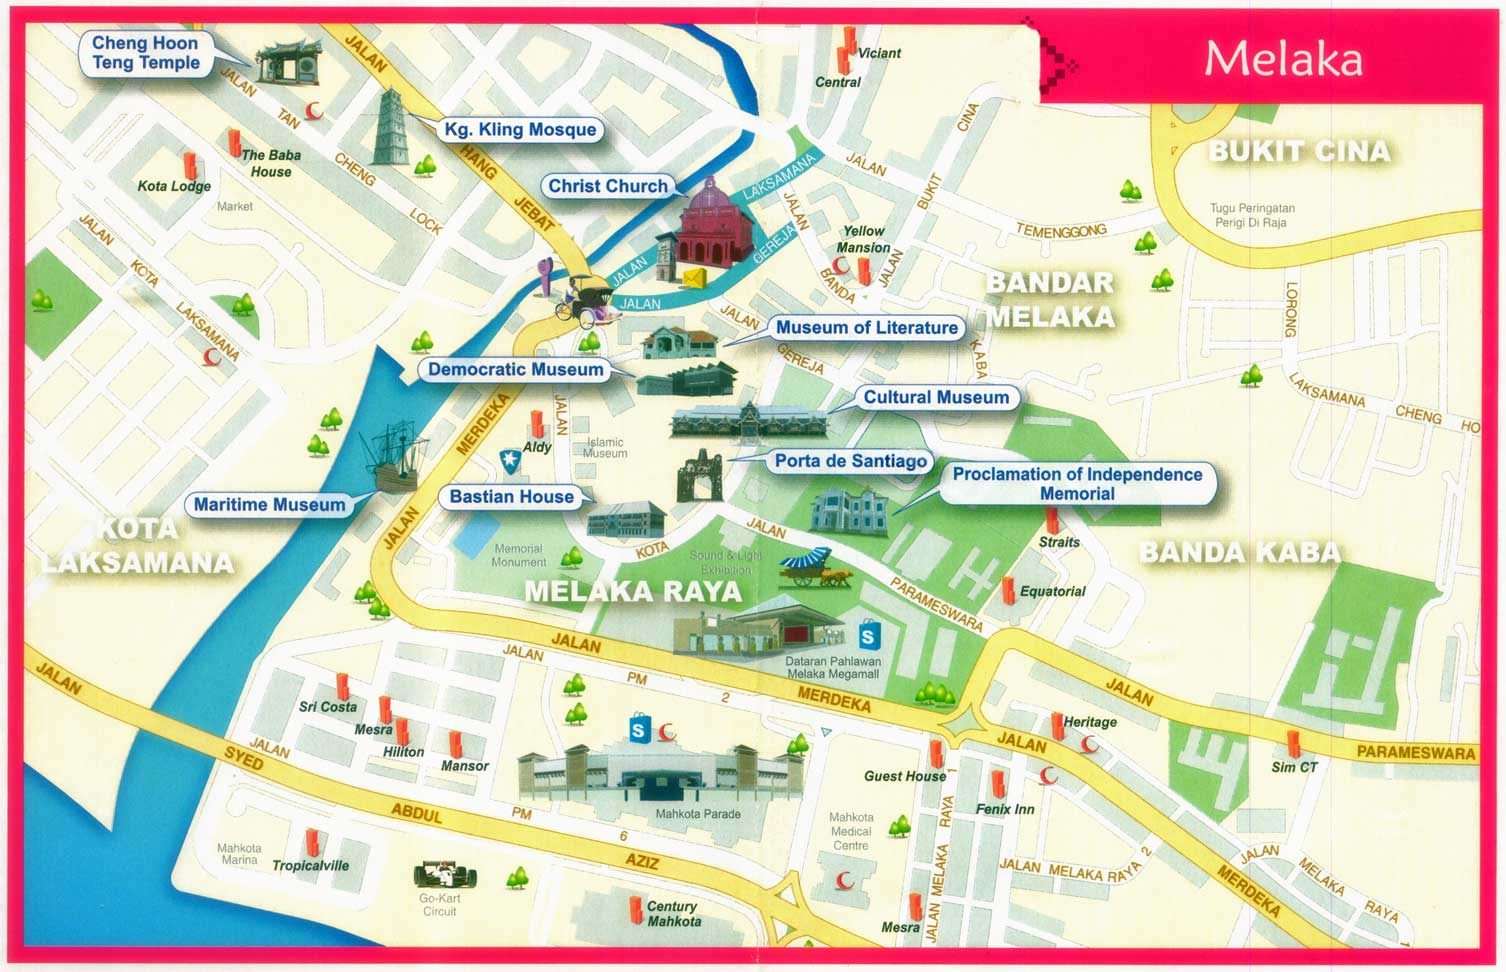 Peta Wisata Melaka (Sumber: Lakashop)